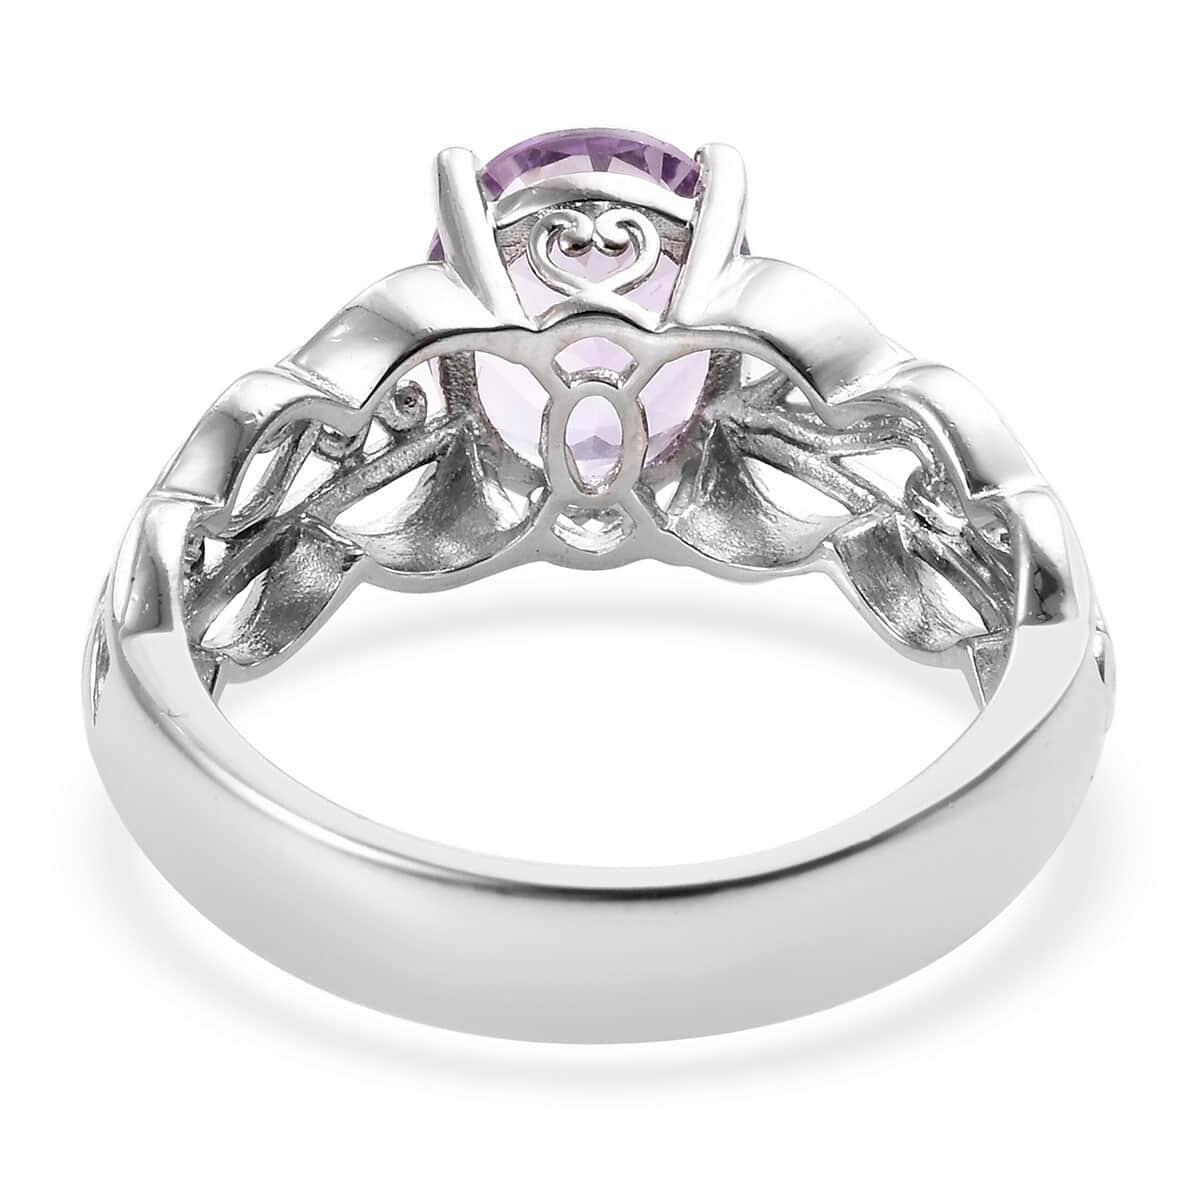 KARIS Rose De France Amethyst Ring in Platinum Bond Brass (Size 11.0) 3.15 ctw